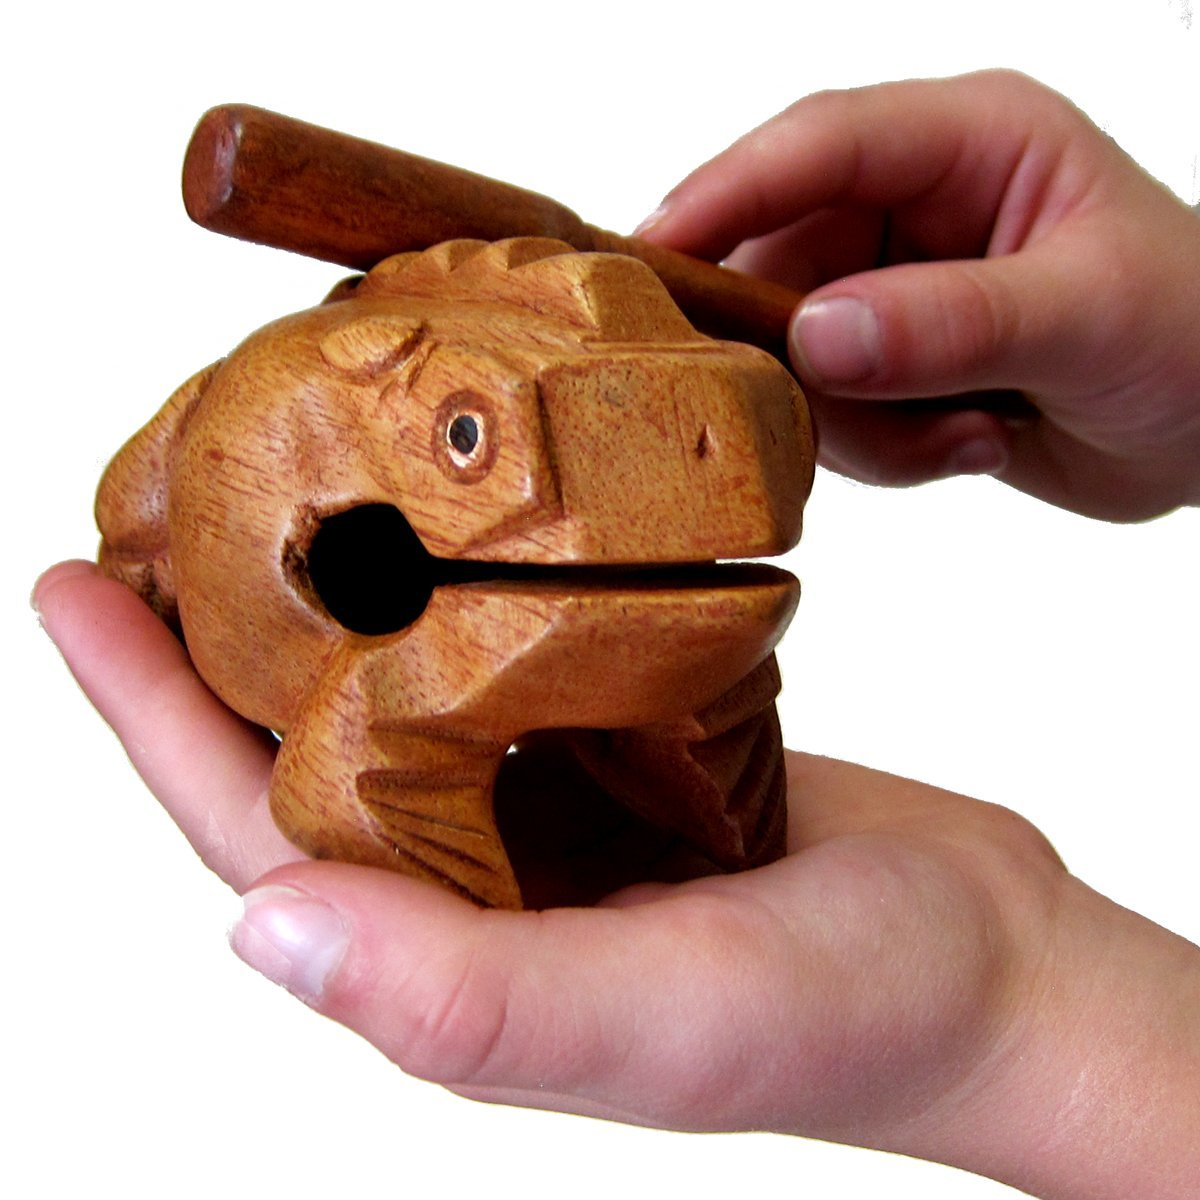 Deluxe Medium 4 Wood Frog Guiro Rasp Musical Instrument Tone Block.